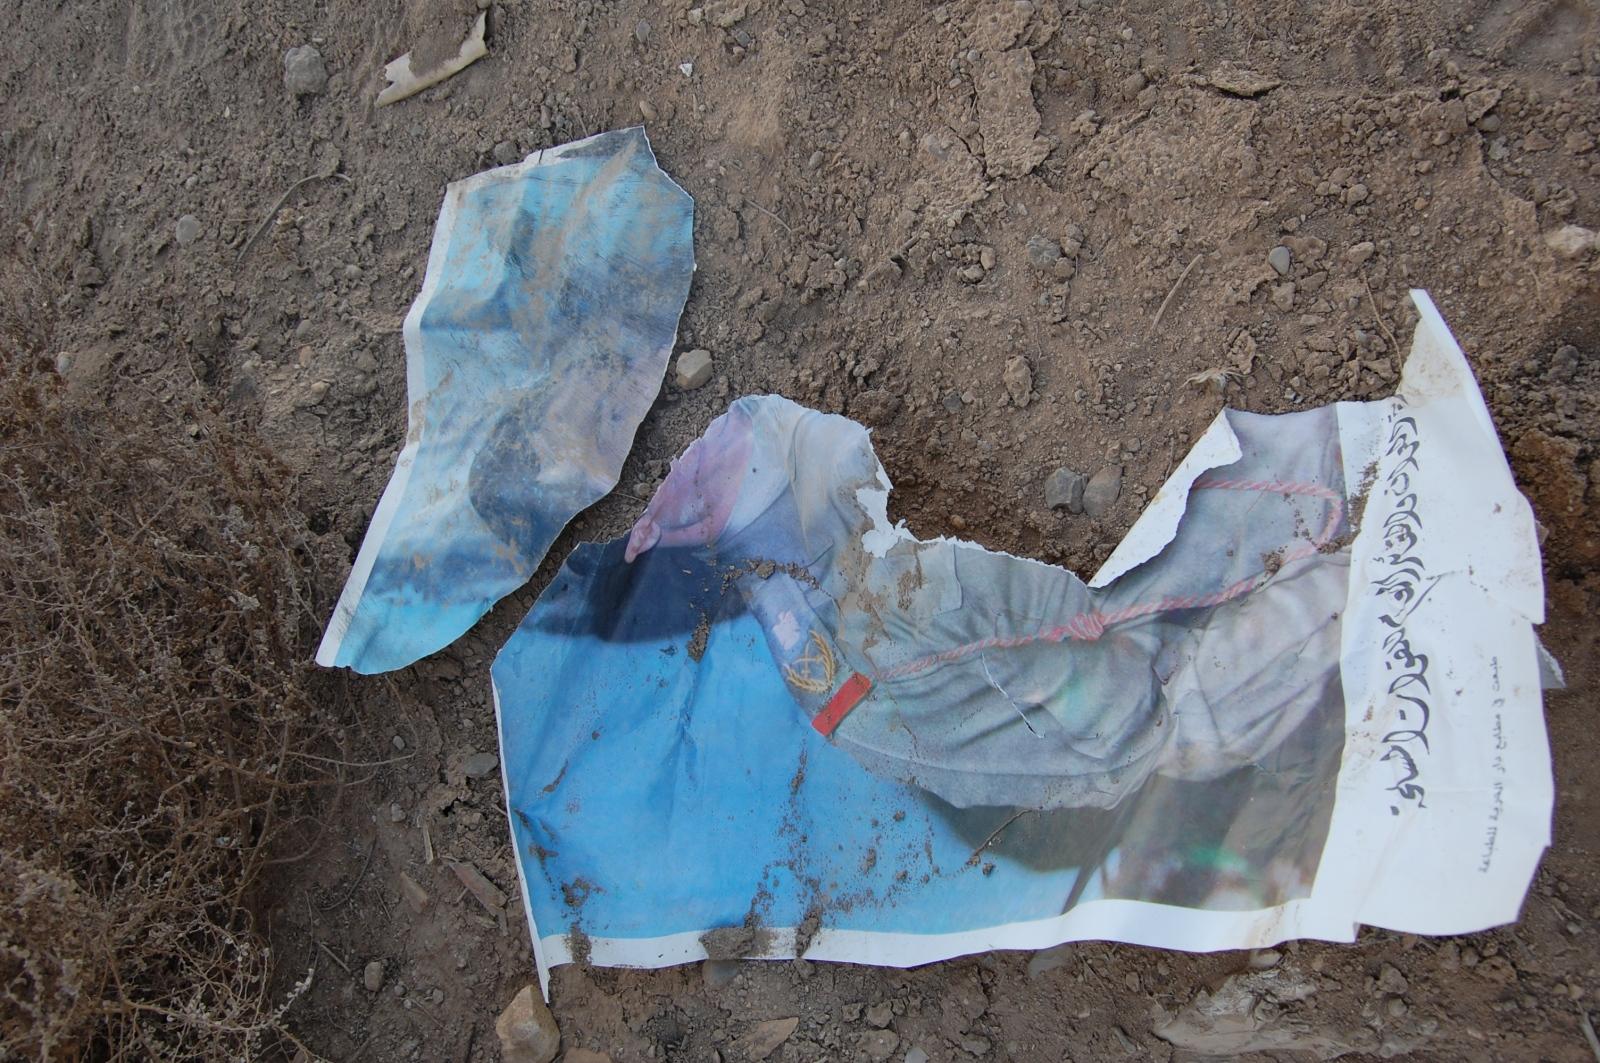 War-torn propaganda from an old regime found near Nasiriyah, Iraq. February 2009.